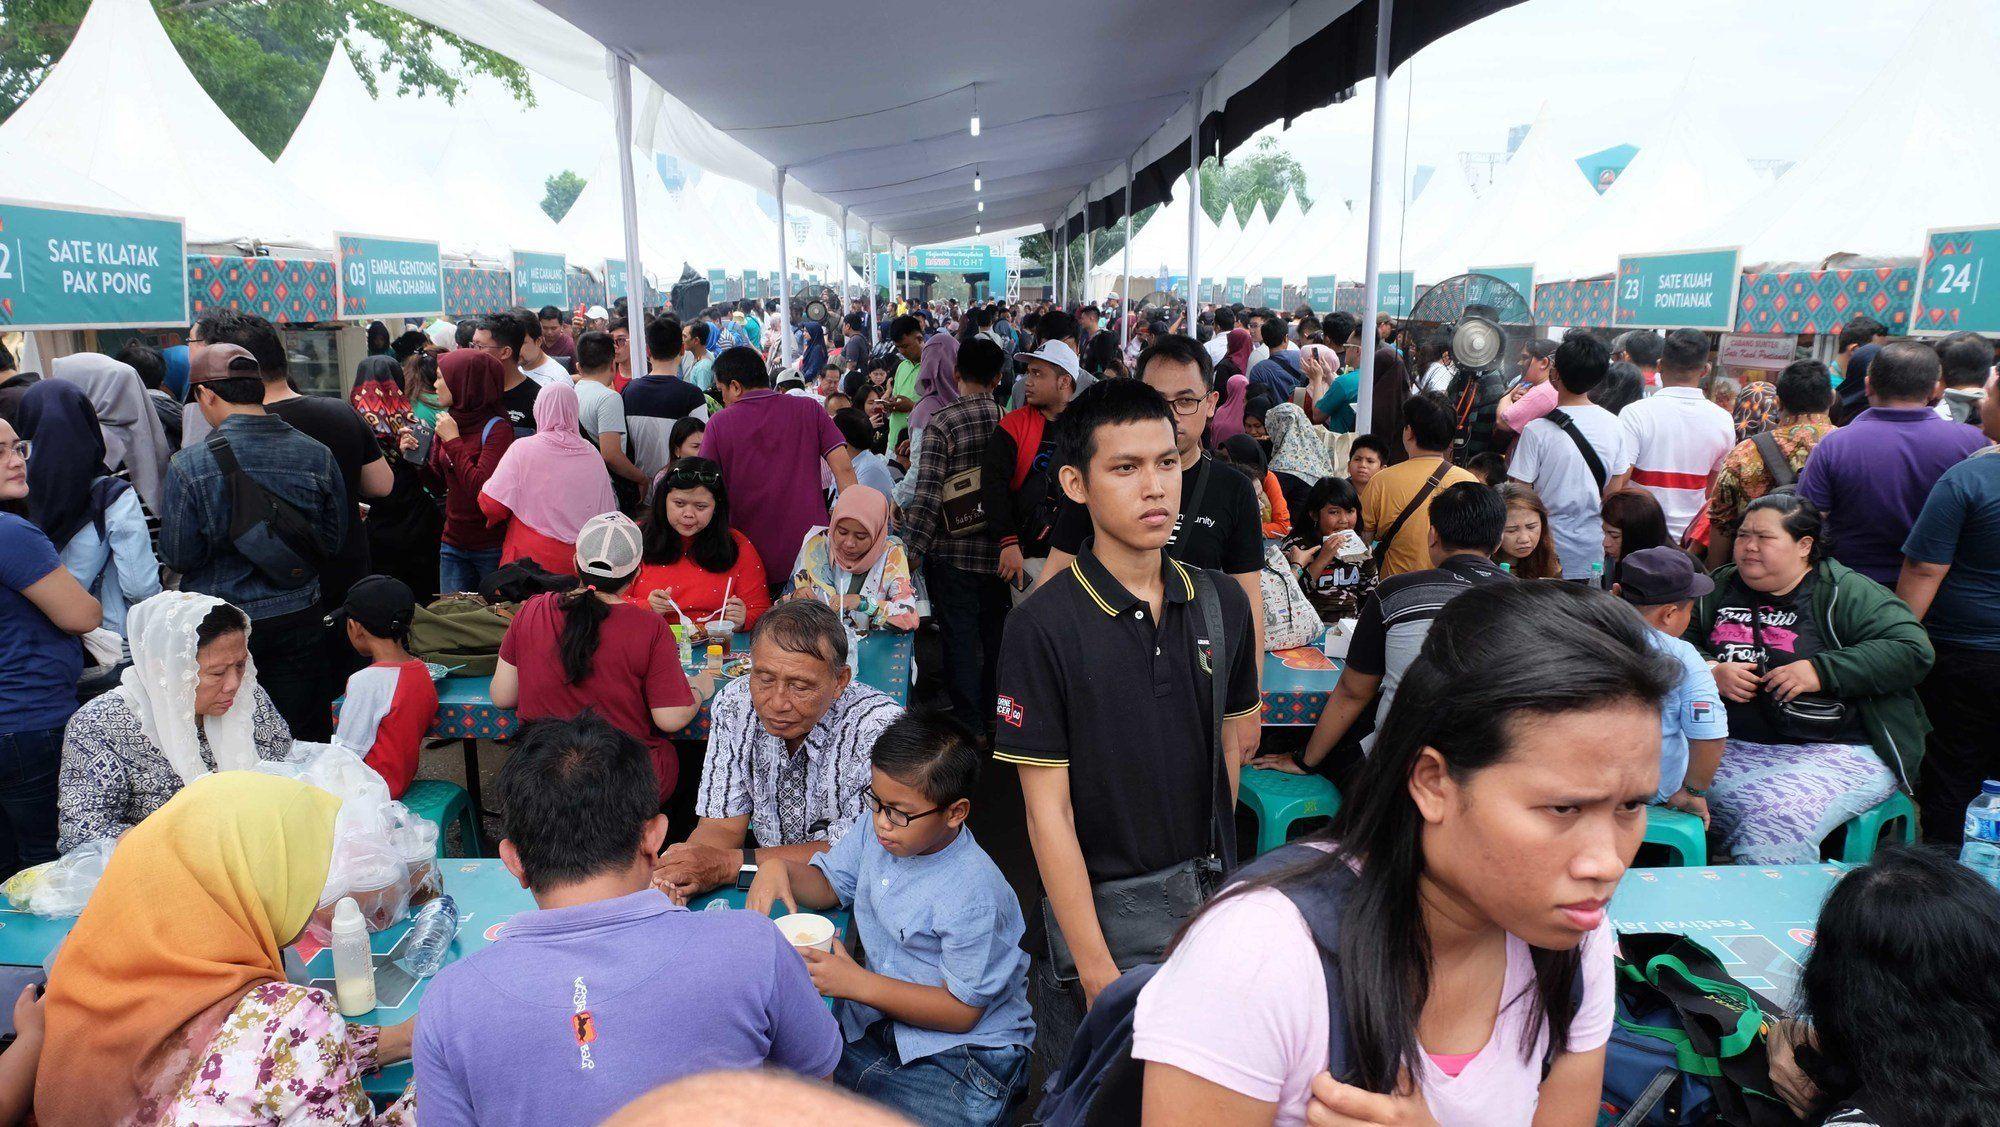 Harus Tahu Cerita Kuliner Legendaris Jakarta di FJB 2019